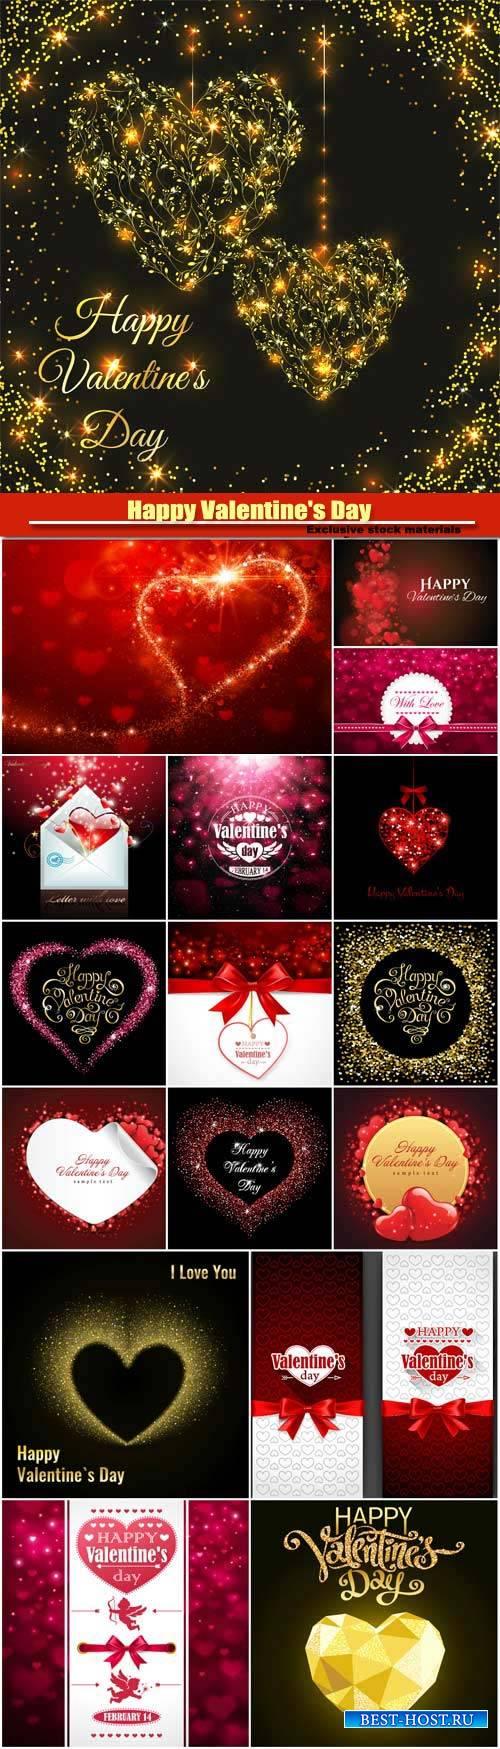 Happy Valentine's Day vector, hearts, romance, love #12